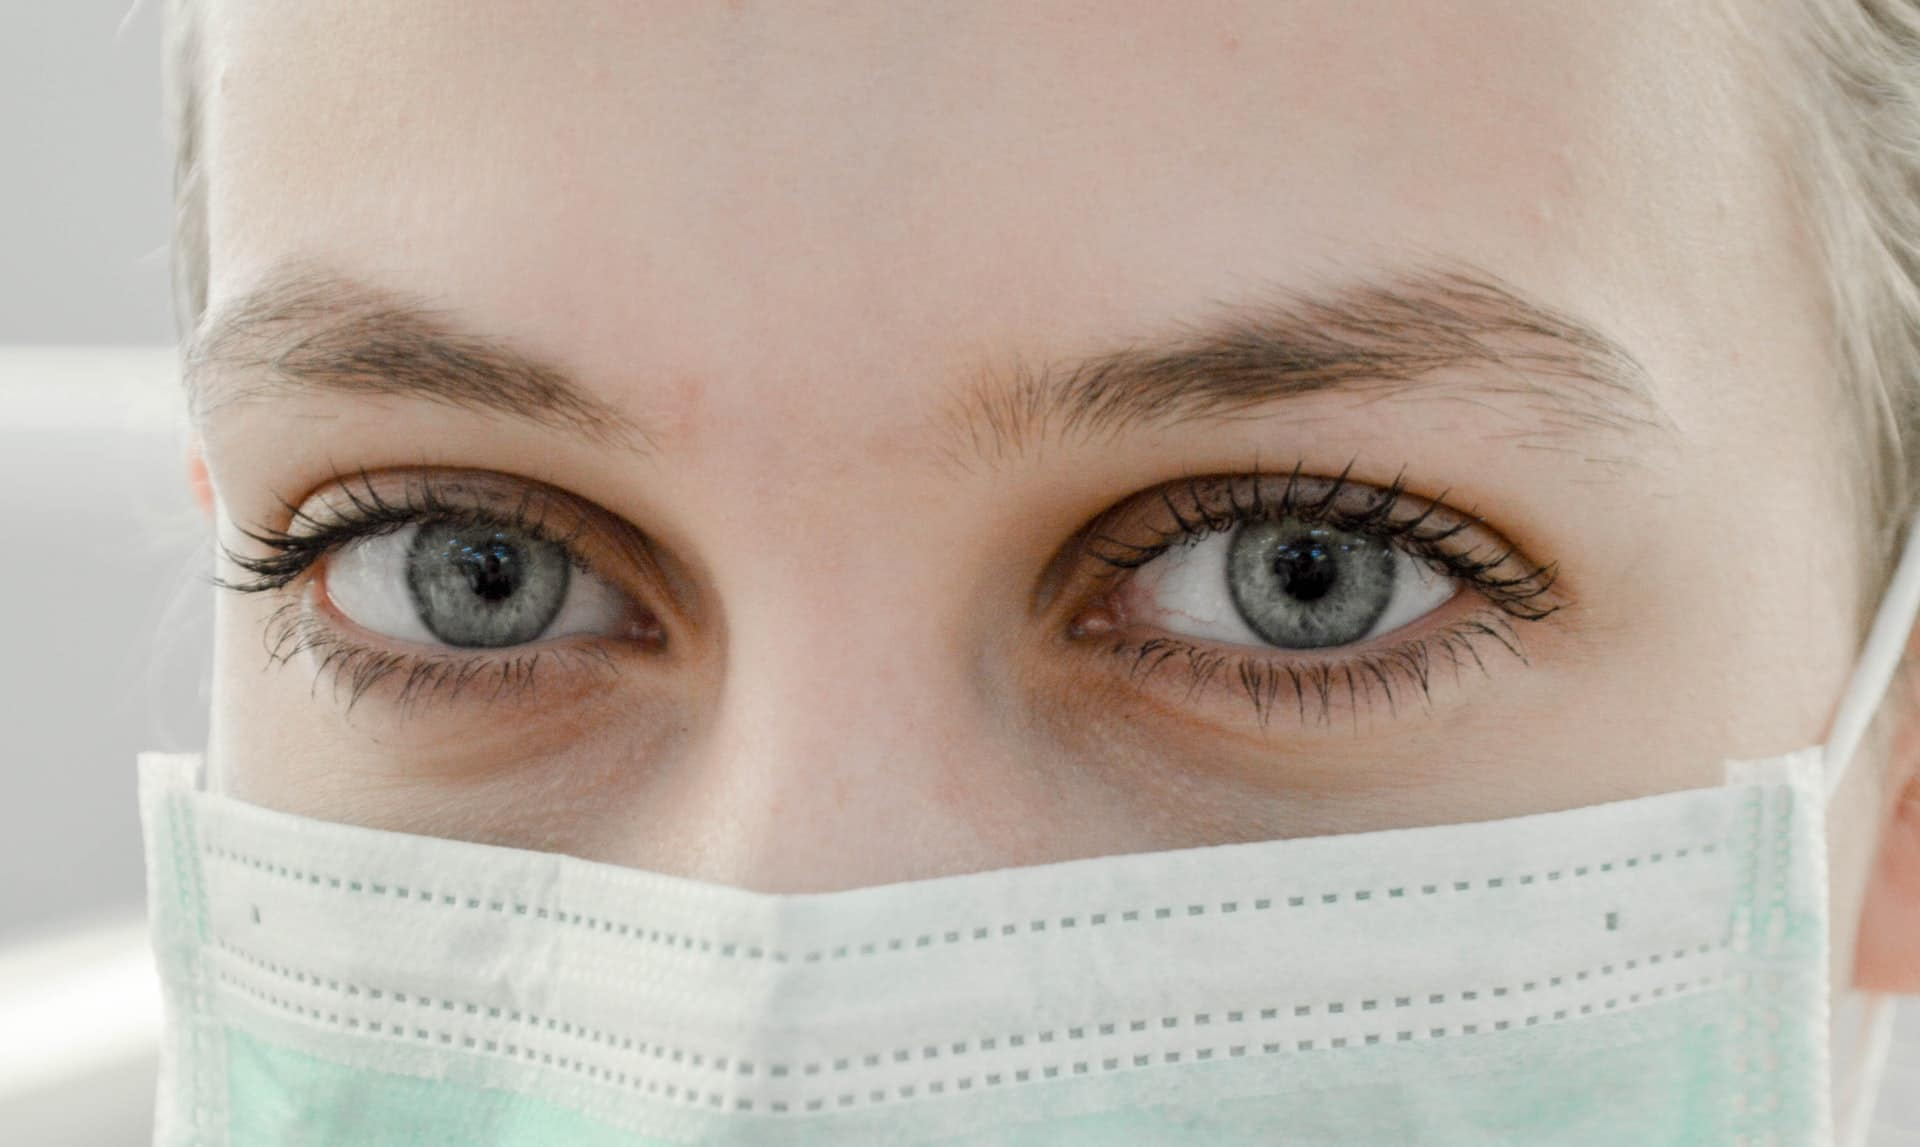 koronavirus ujrafertozodes vedettseg